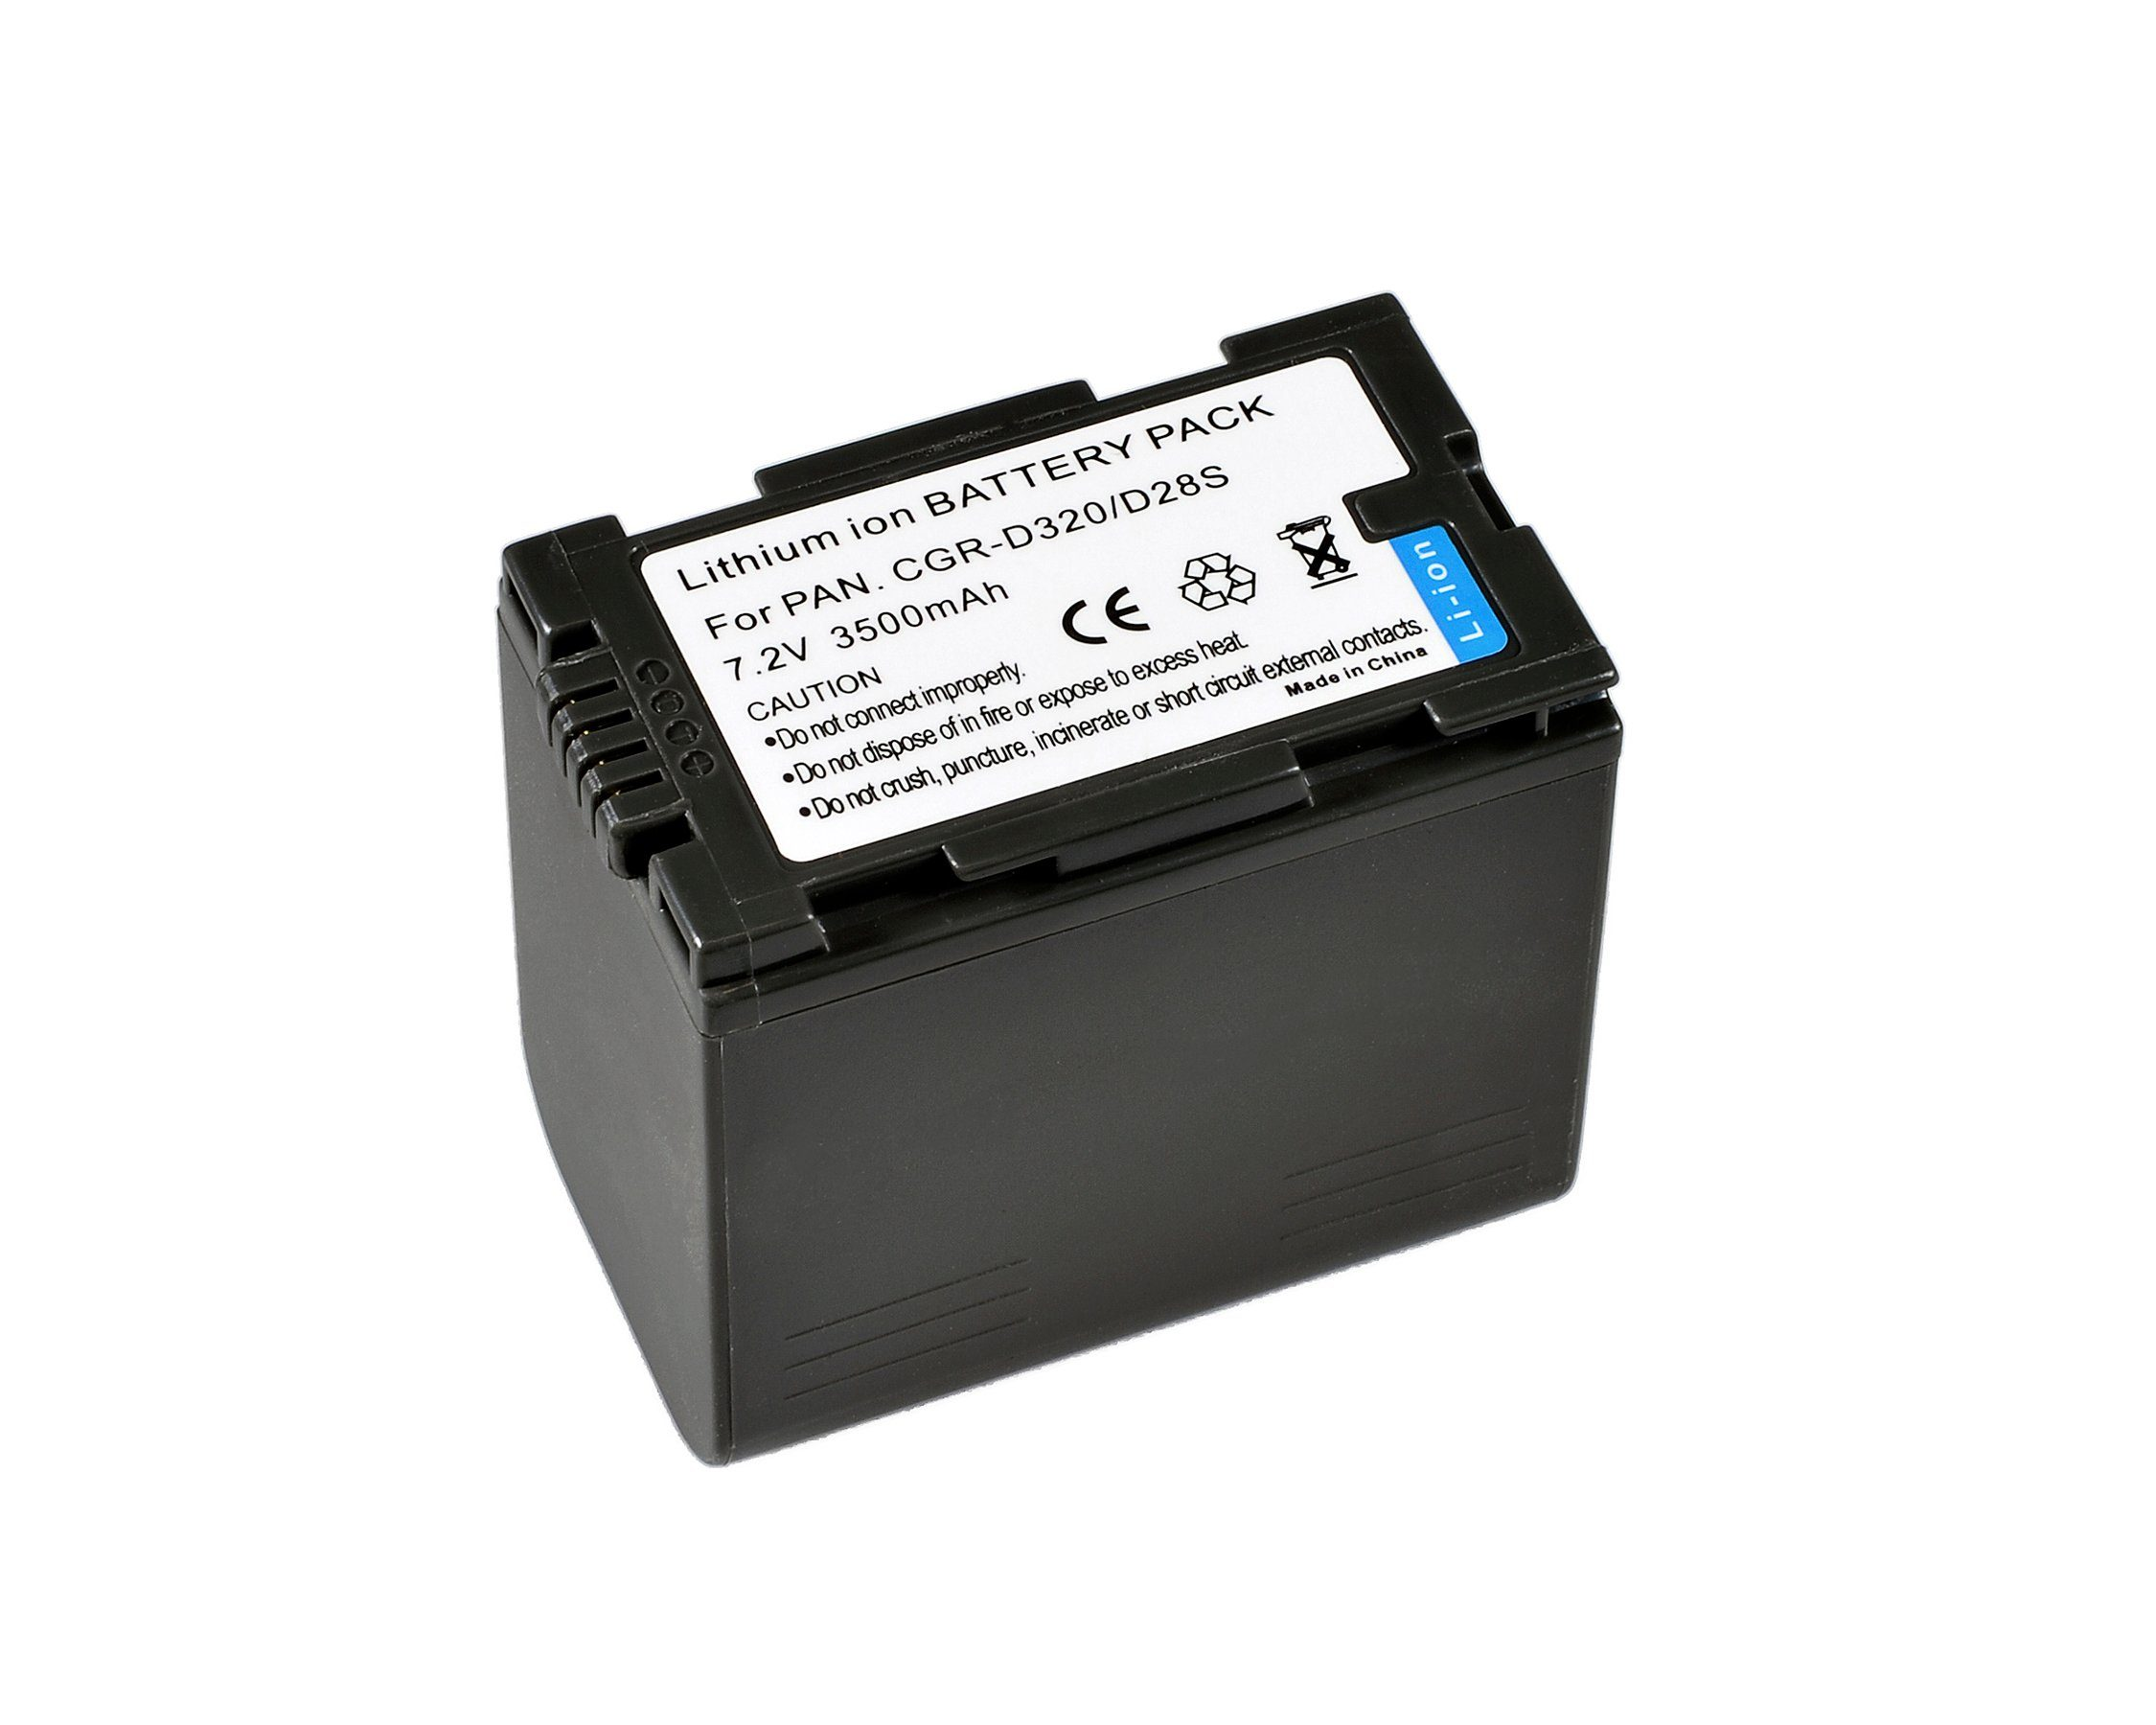 BRESSER Akku »Lithium-Ionen Akku für Panasonic CGR-D320/CGR-D28S«